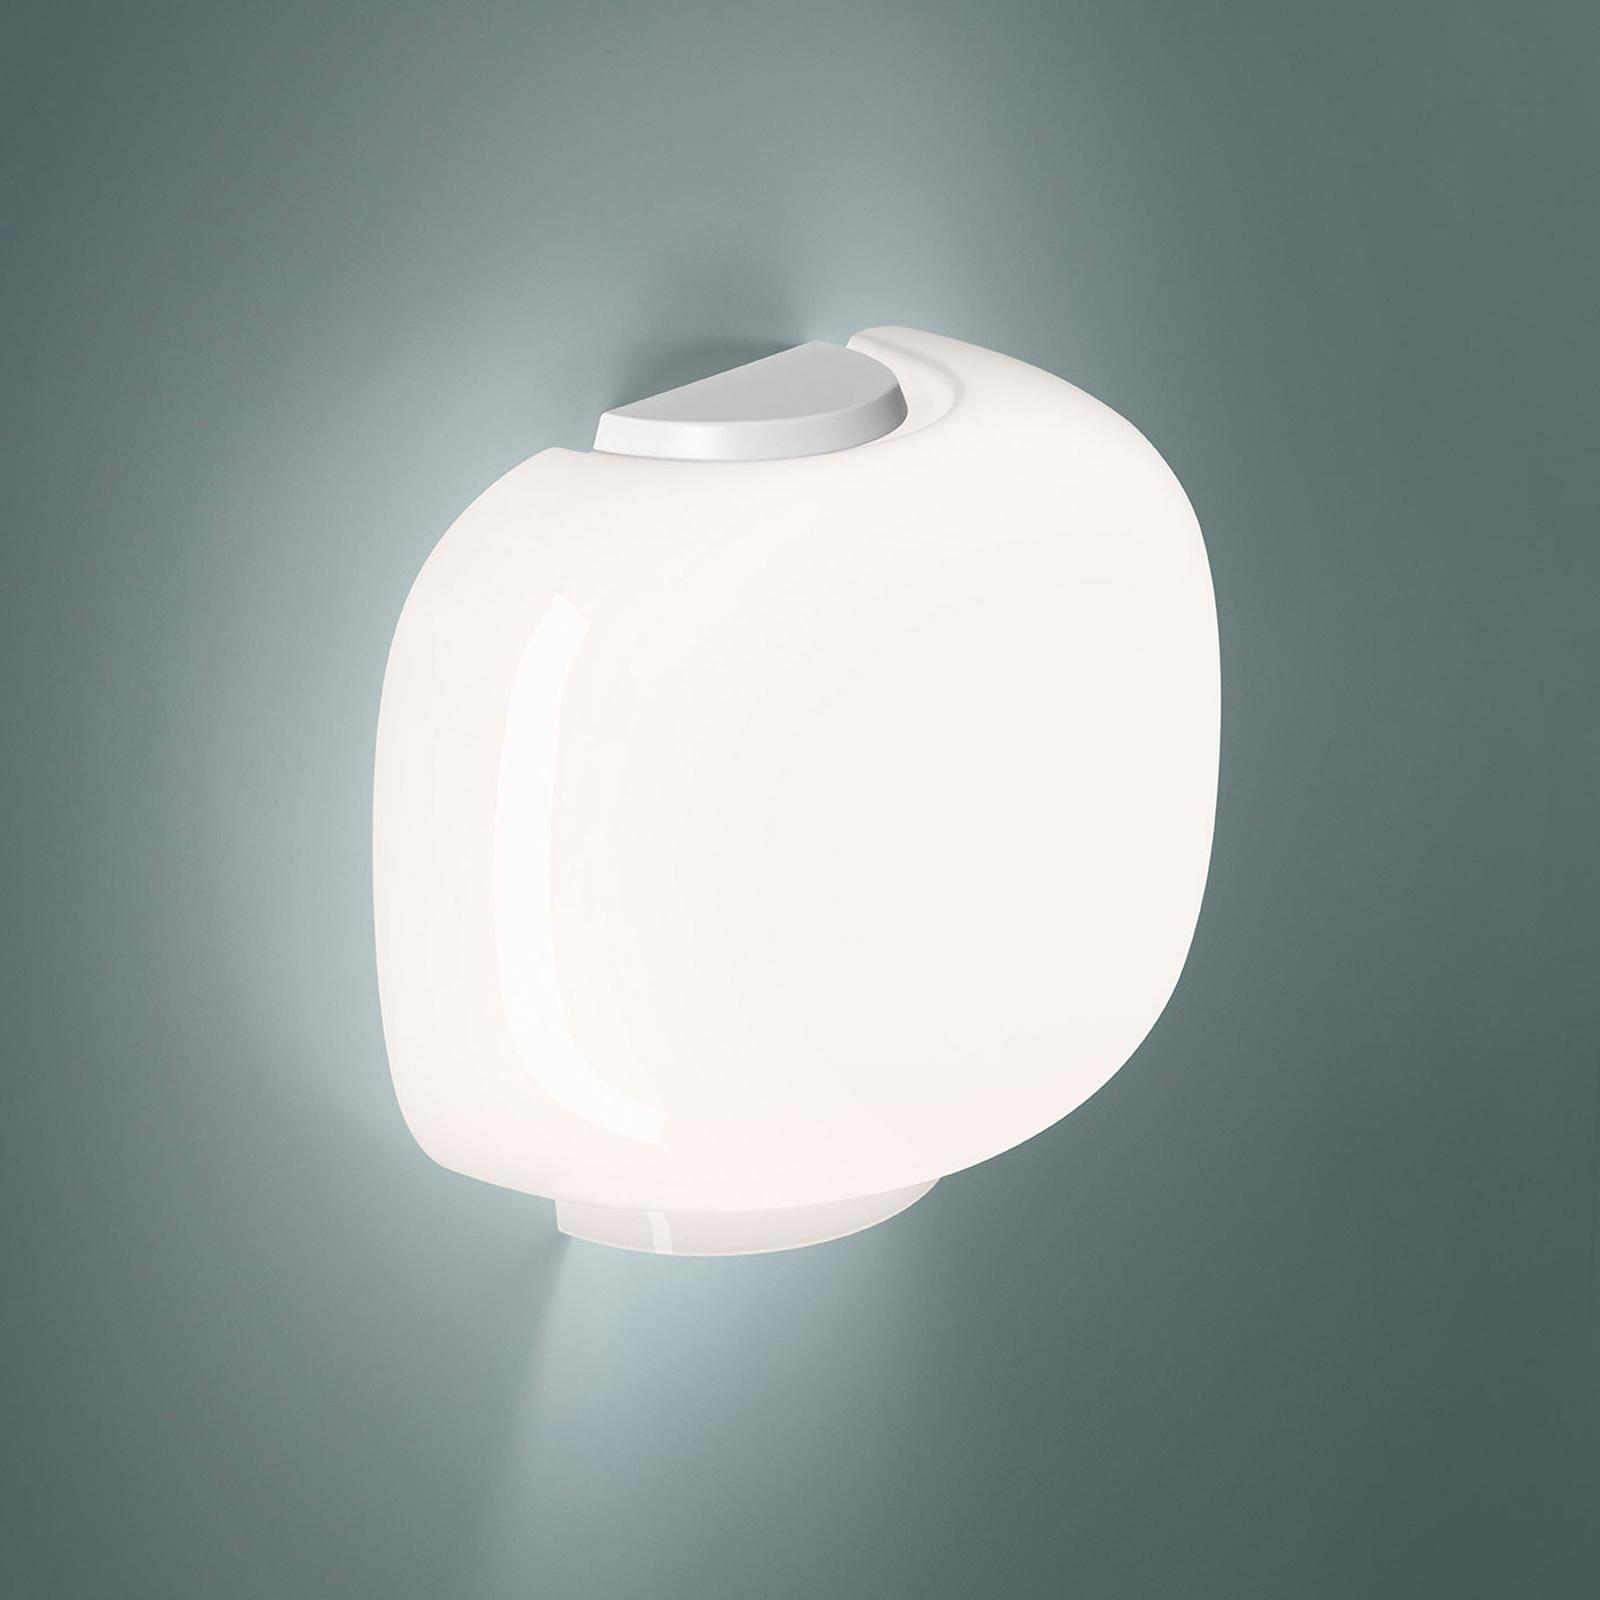 Foscarini Chouchin 3 Semi My Light weiß